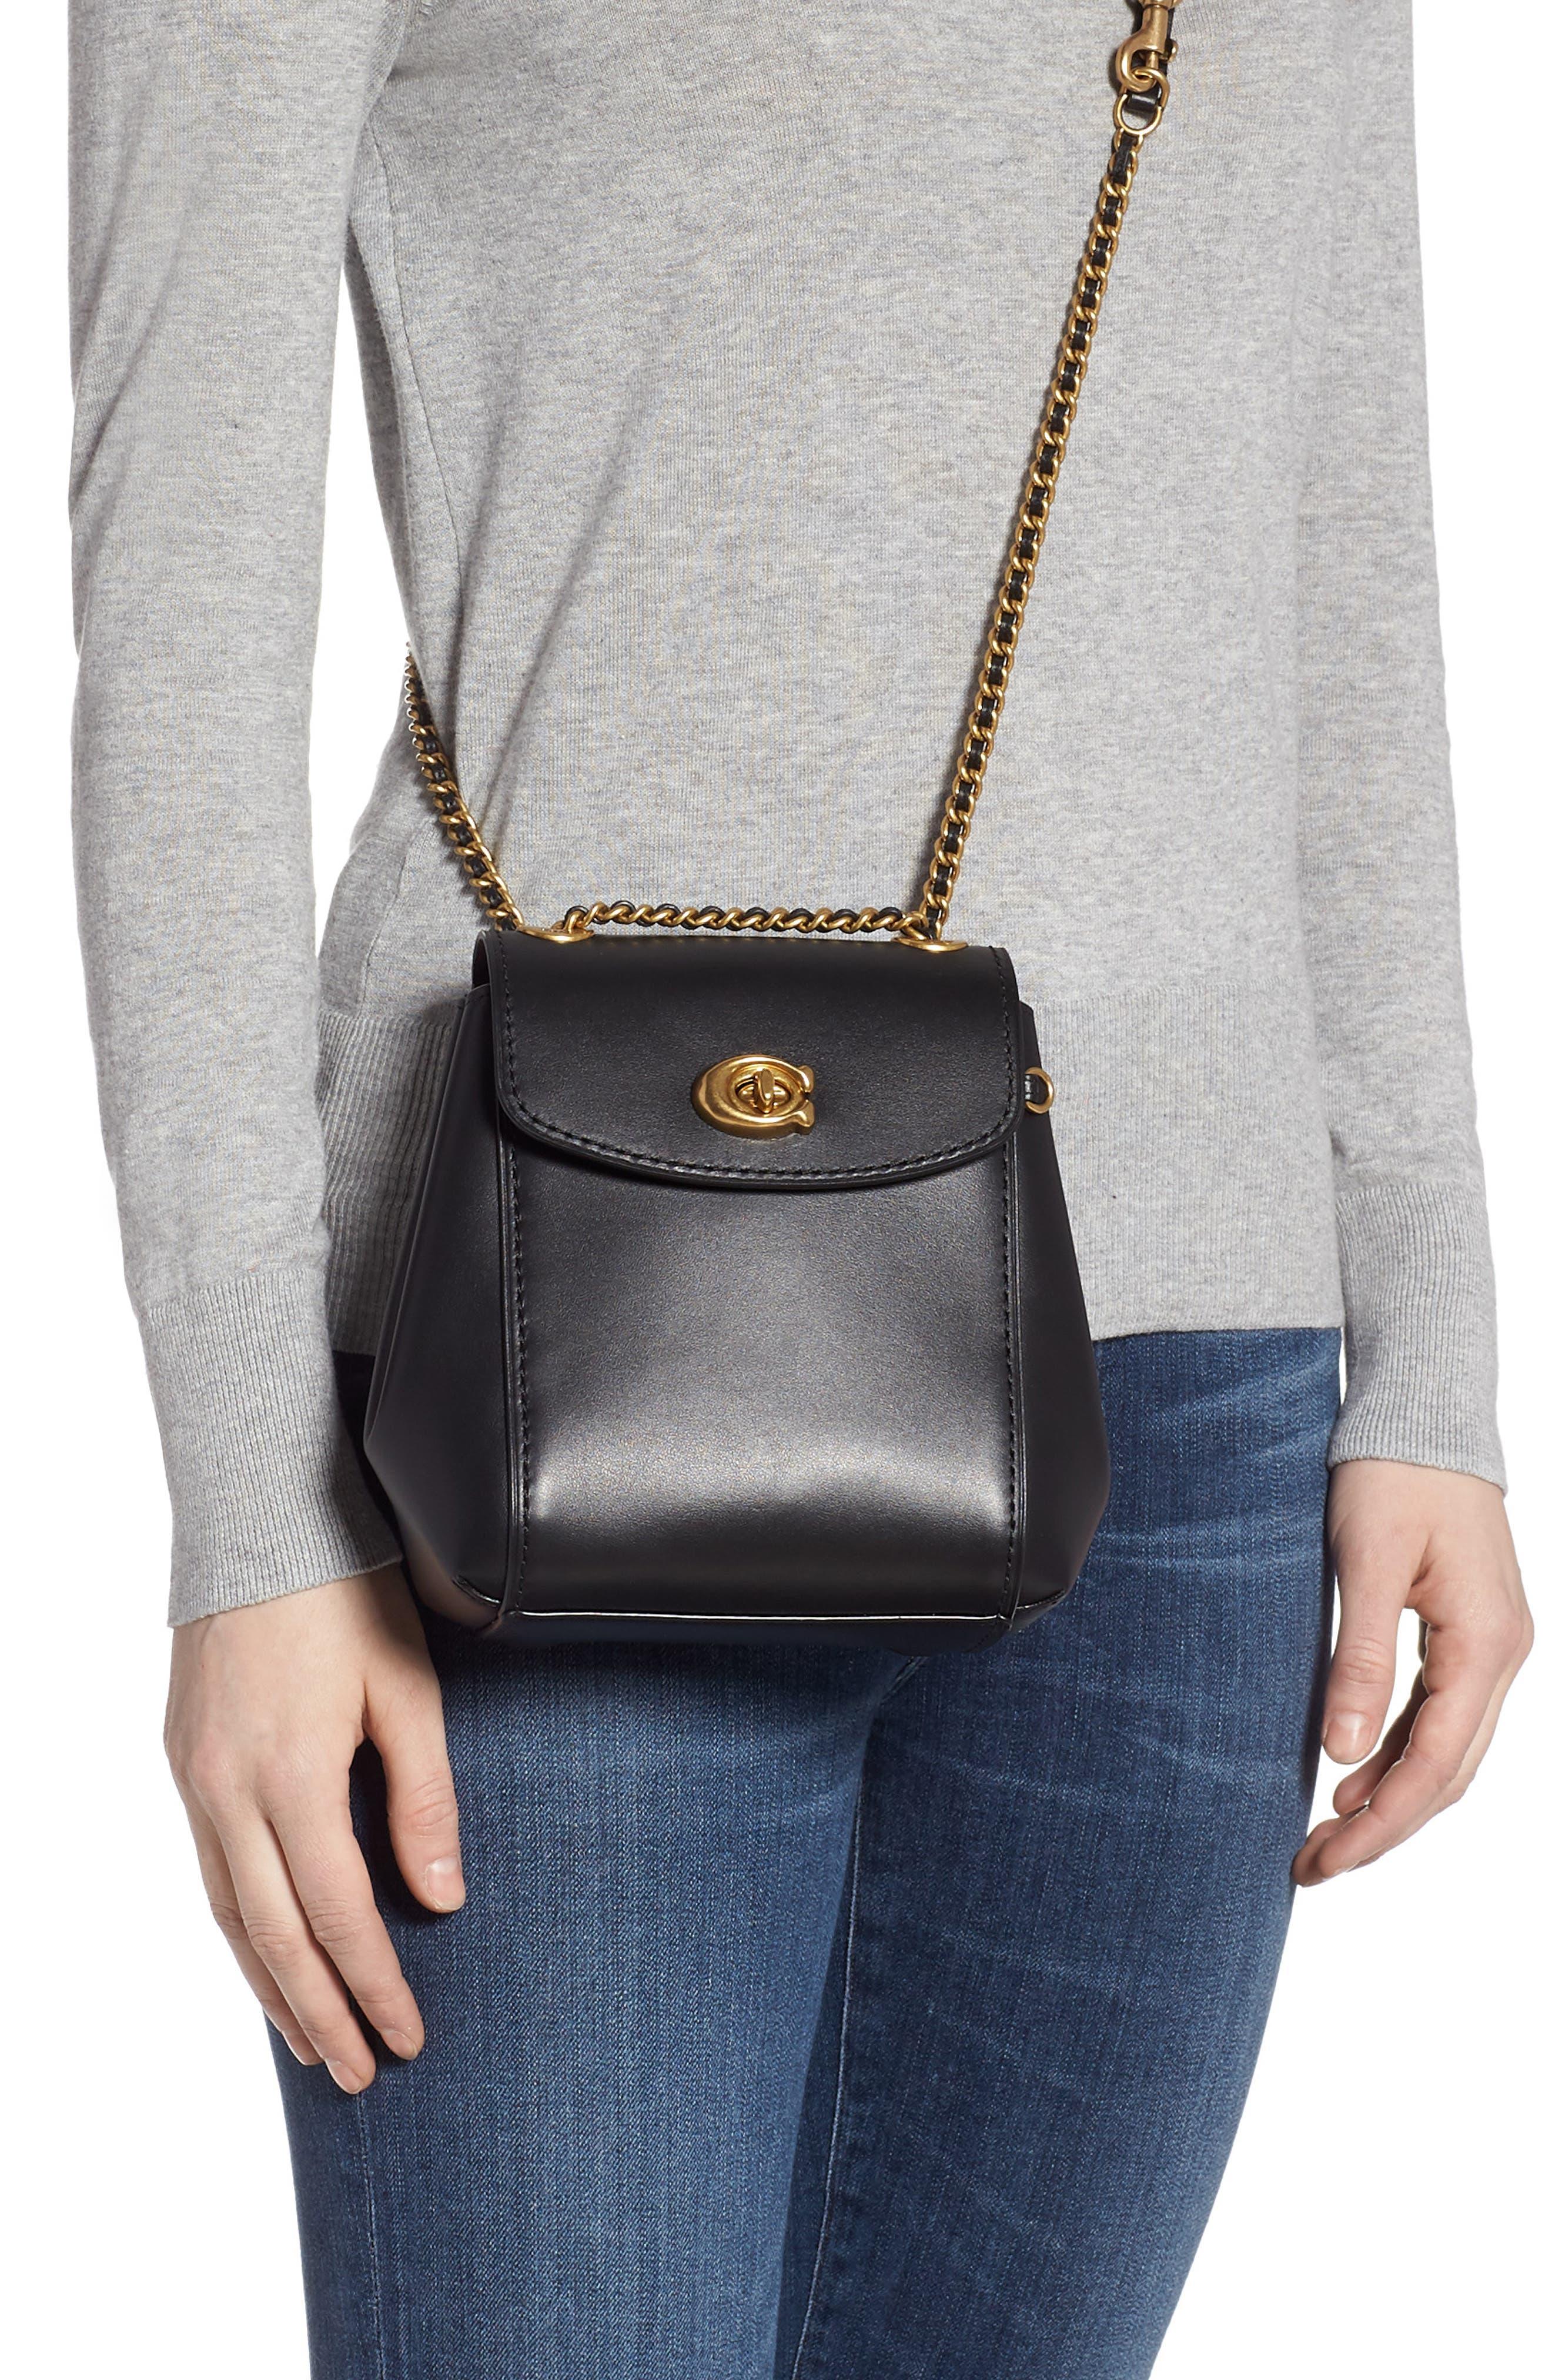 COACH, Parker 16 Convertible Calfskin Leather Backpack, Alternate thumbnail 4, color, B4/ BLACK